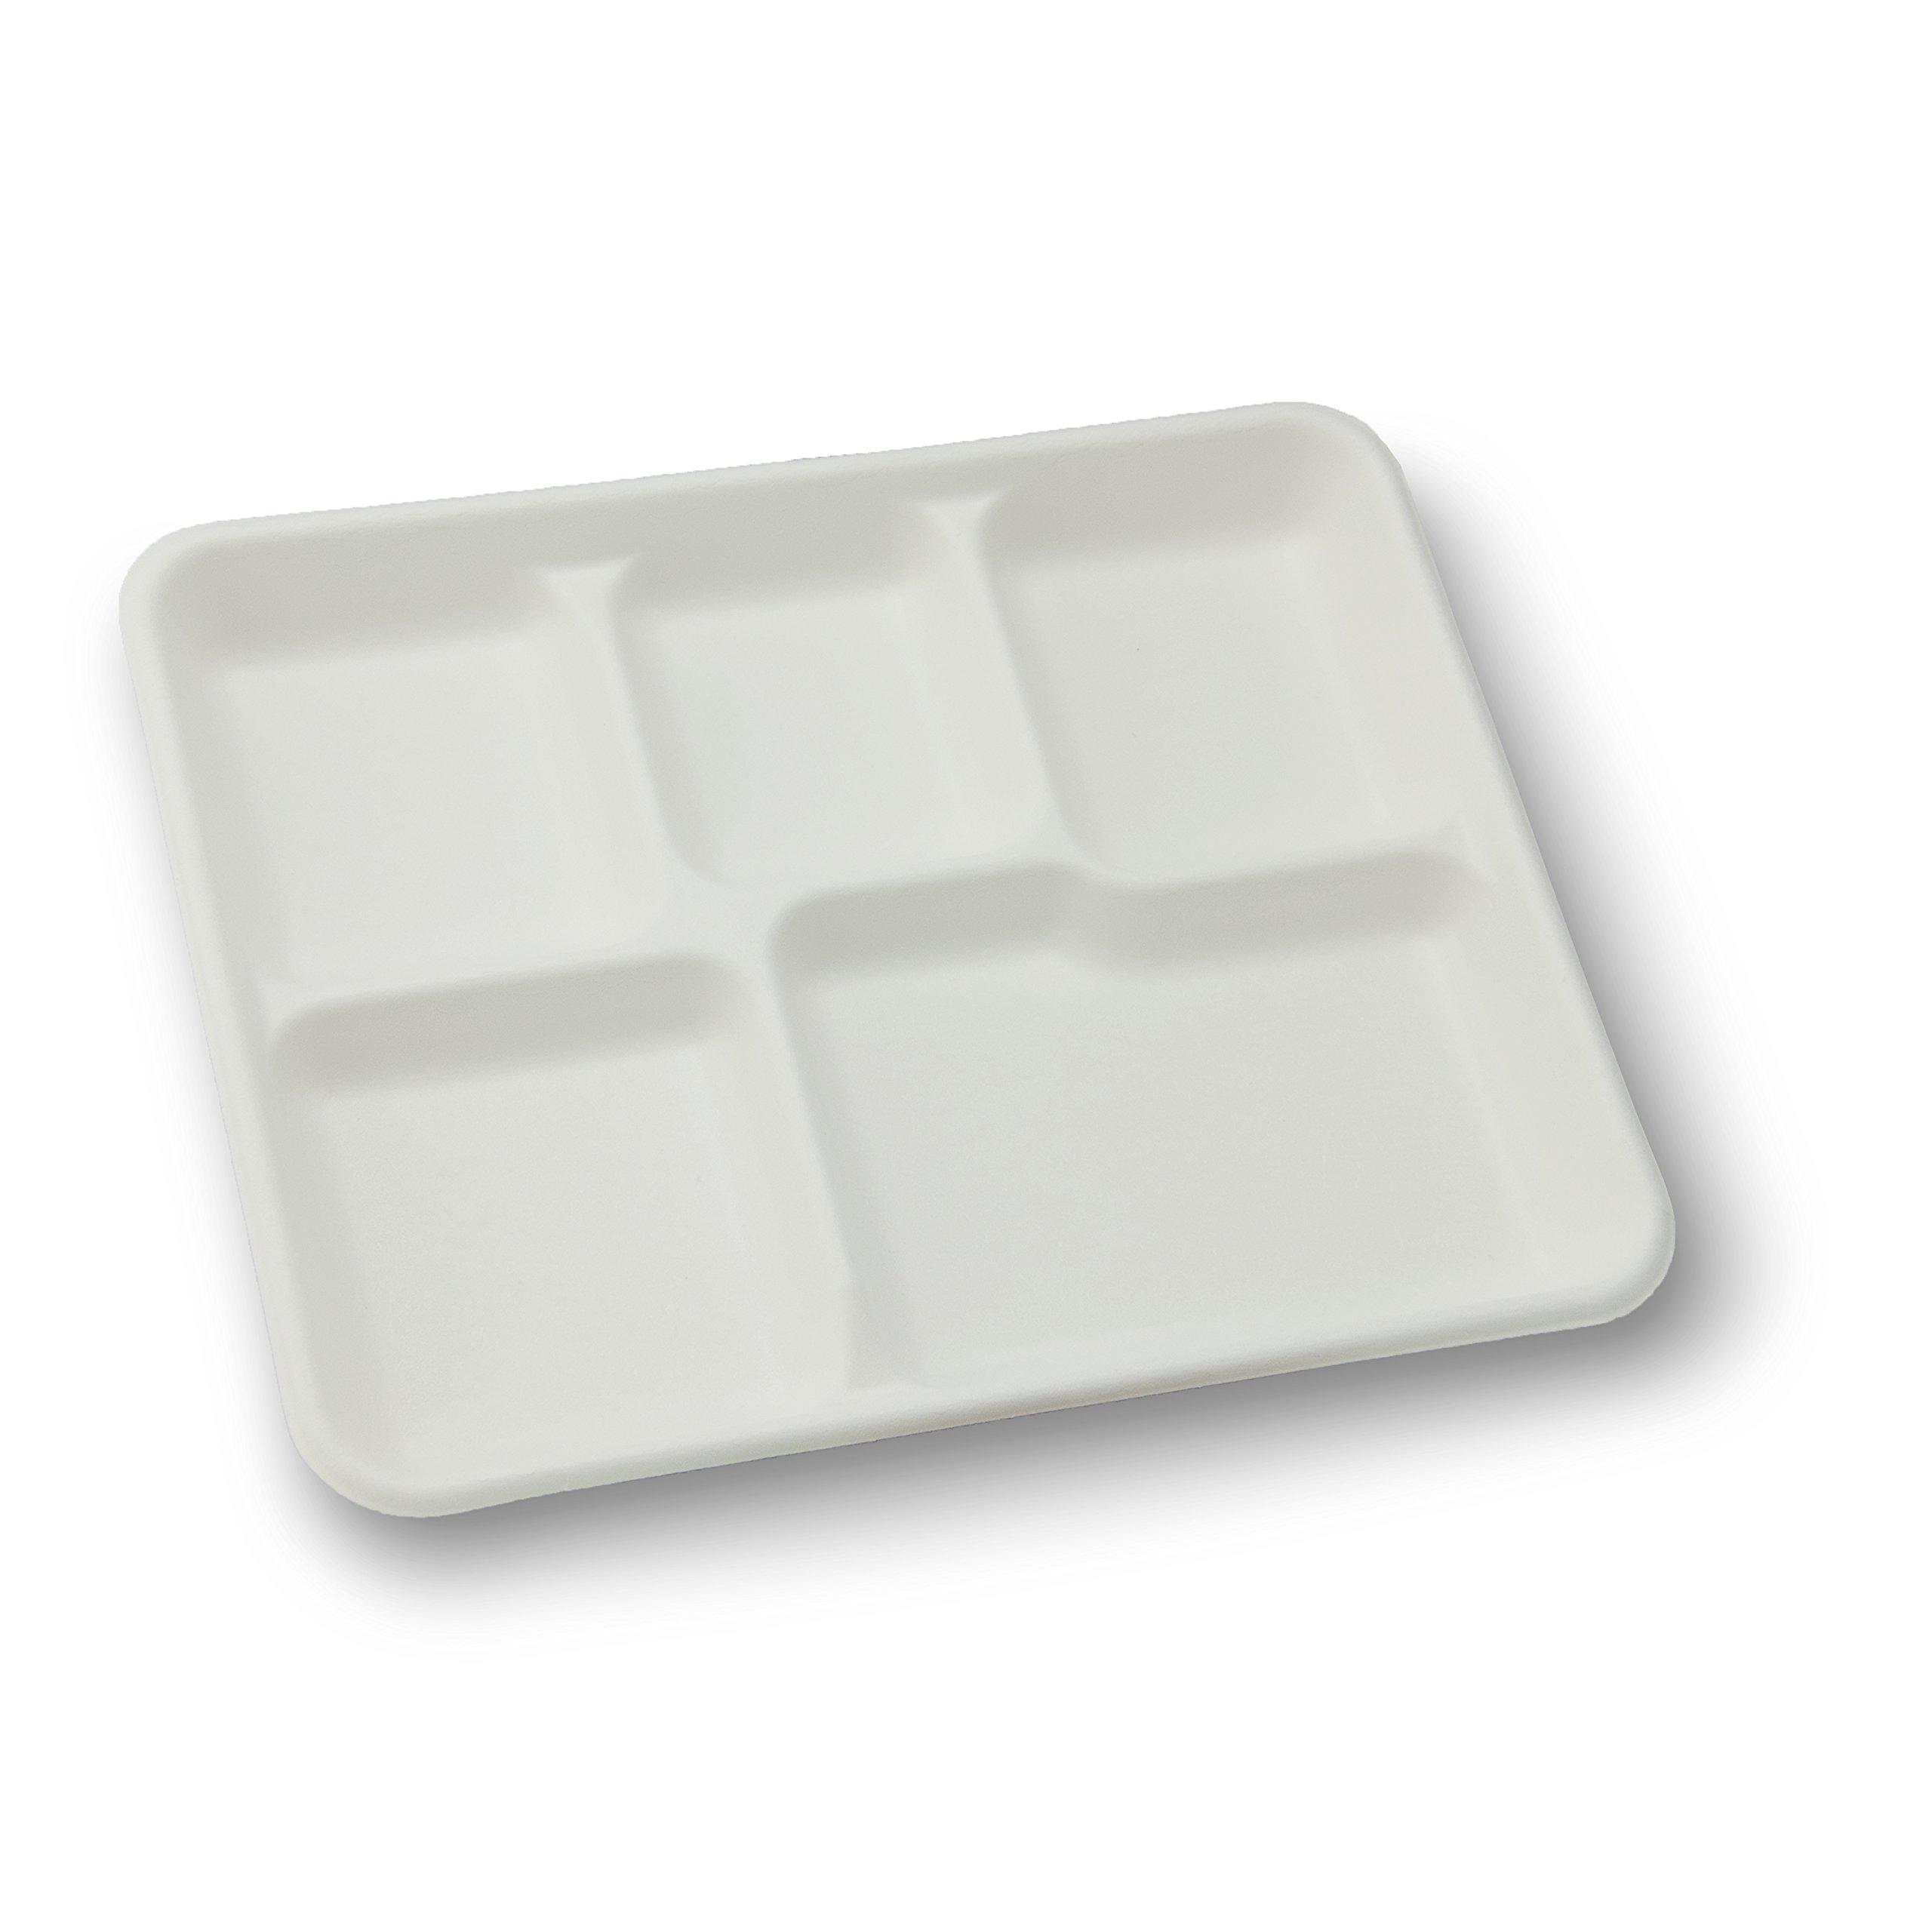 Stalkmarket 100% Compostable Sugar Cane Fiber Heavy Duty Plate, 5-Compartment American Tray, 500-Count Case